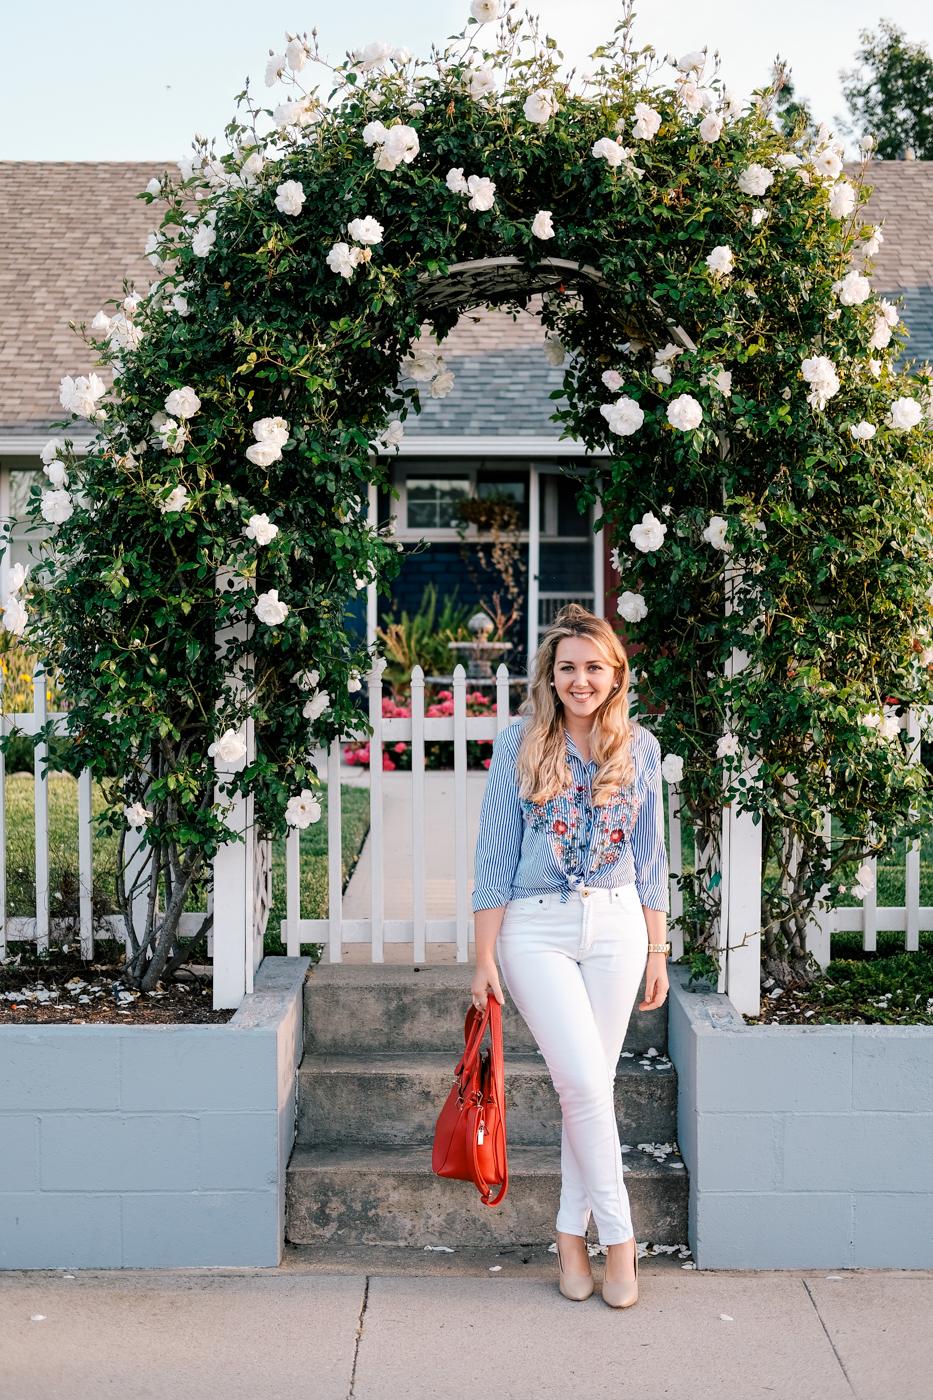 Debora Dahl, embroidered blouse, trend